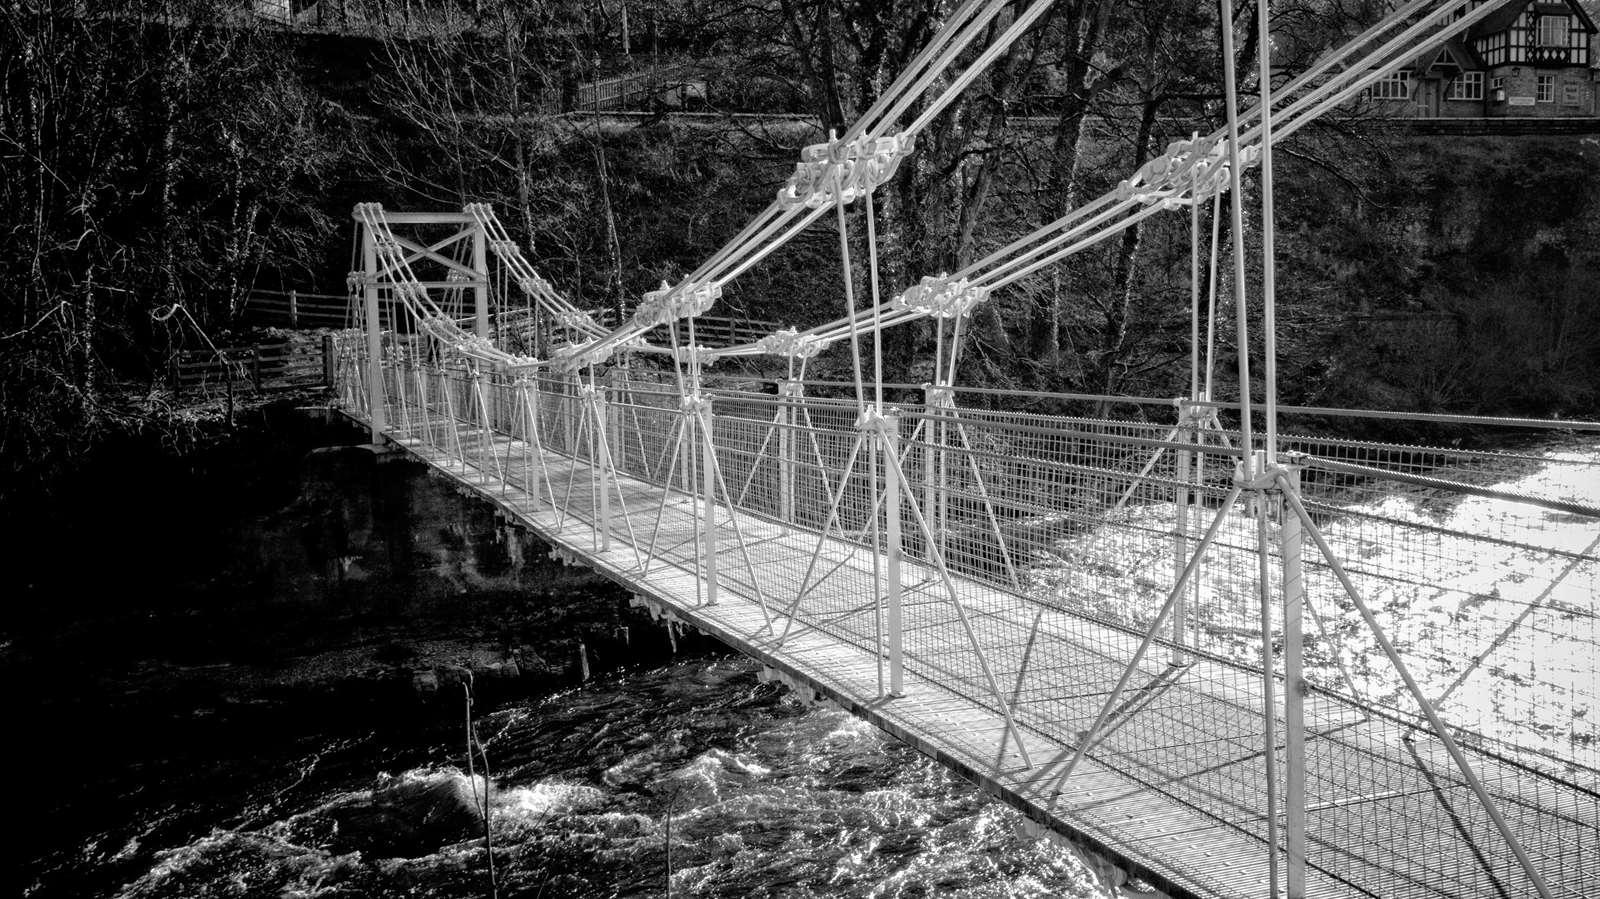 The Chainbridge